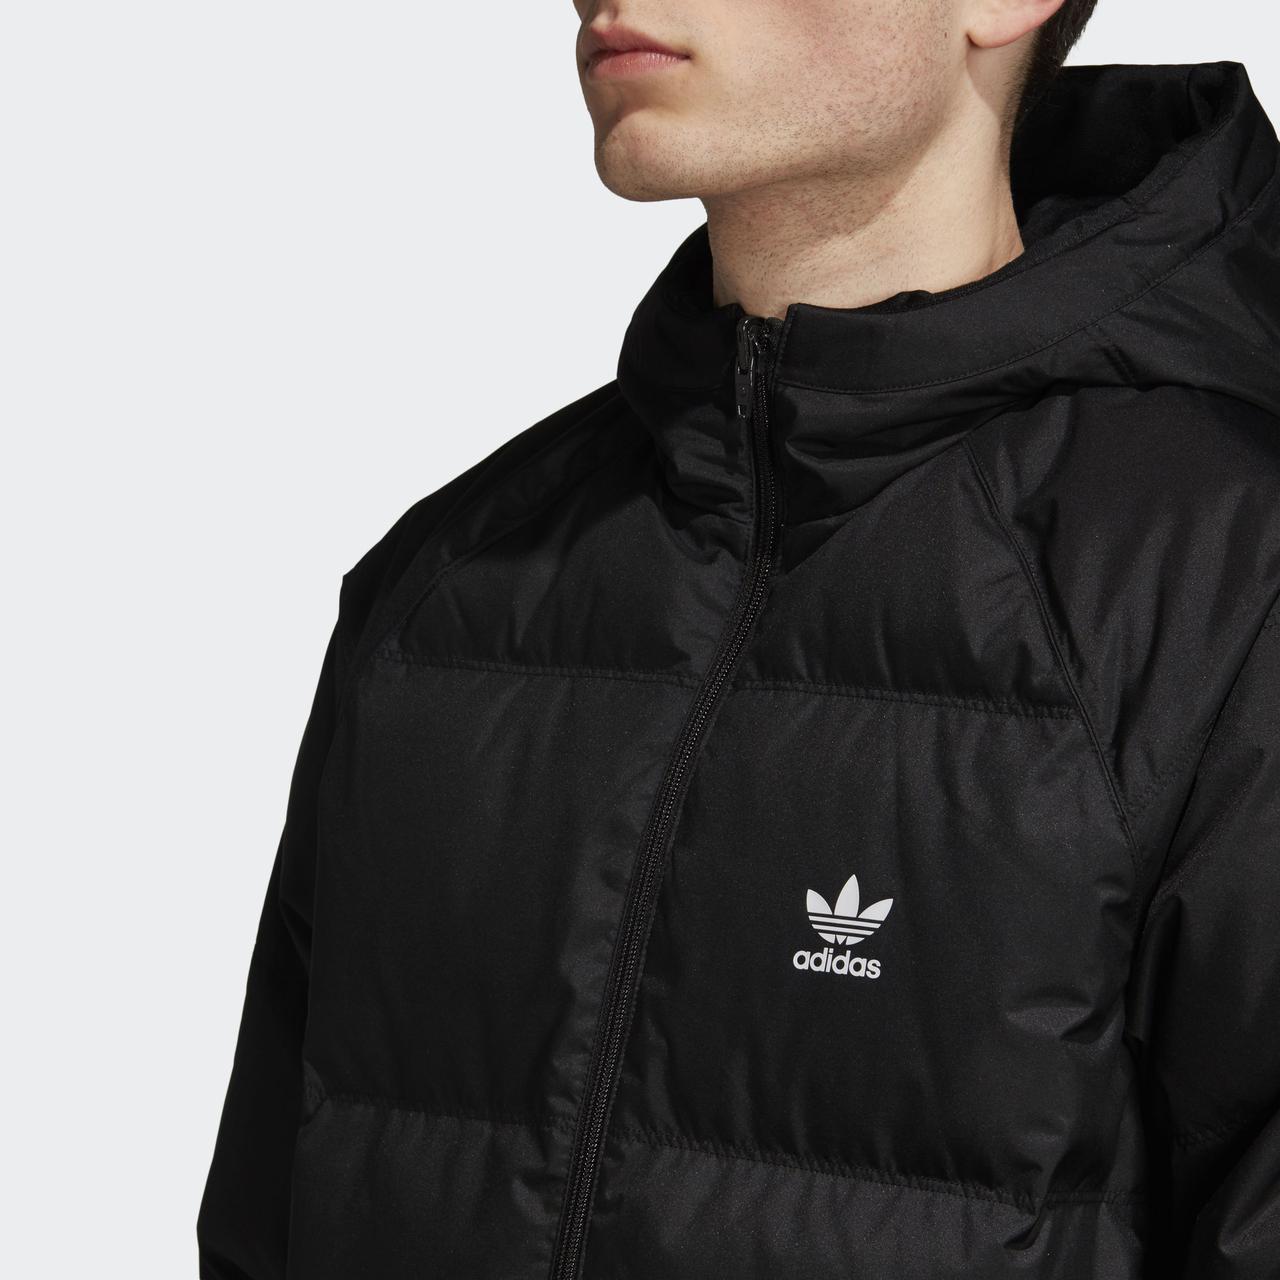 bdfeef3ae198 Купить Мужская куртка Adidas Originals SST (Артикул  DH5003) в ...